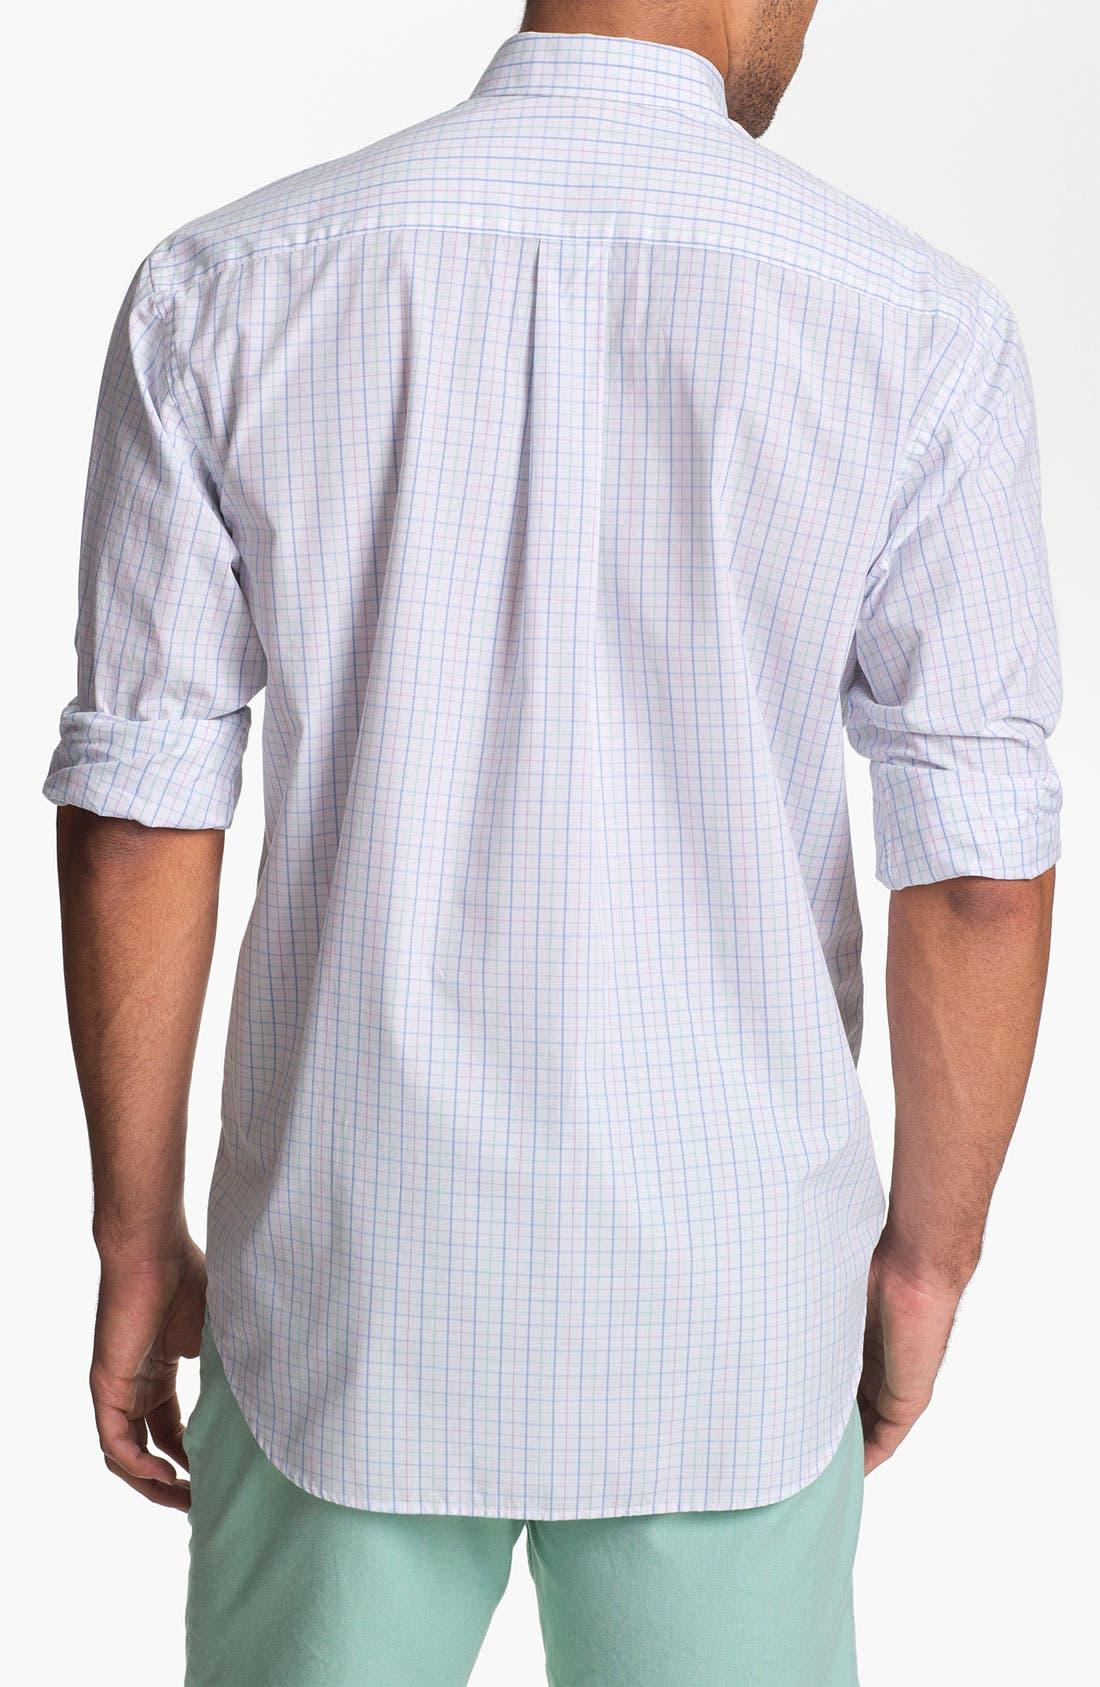 Alternate Image 2  - Vineyard Vines 'Cades Bay' Regular Fit Sport Shirt